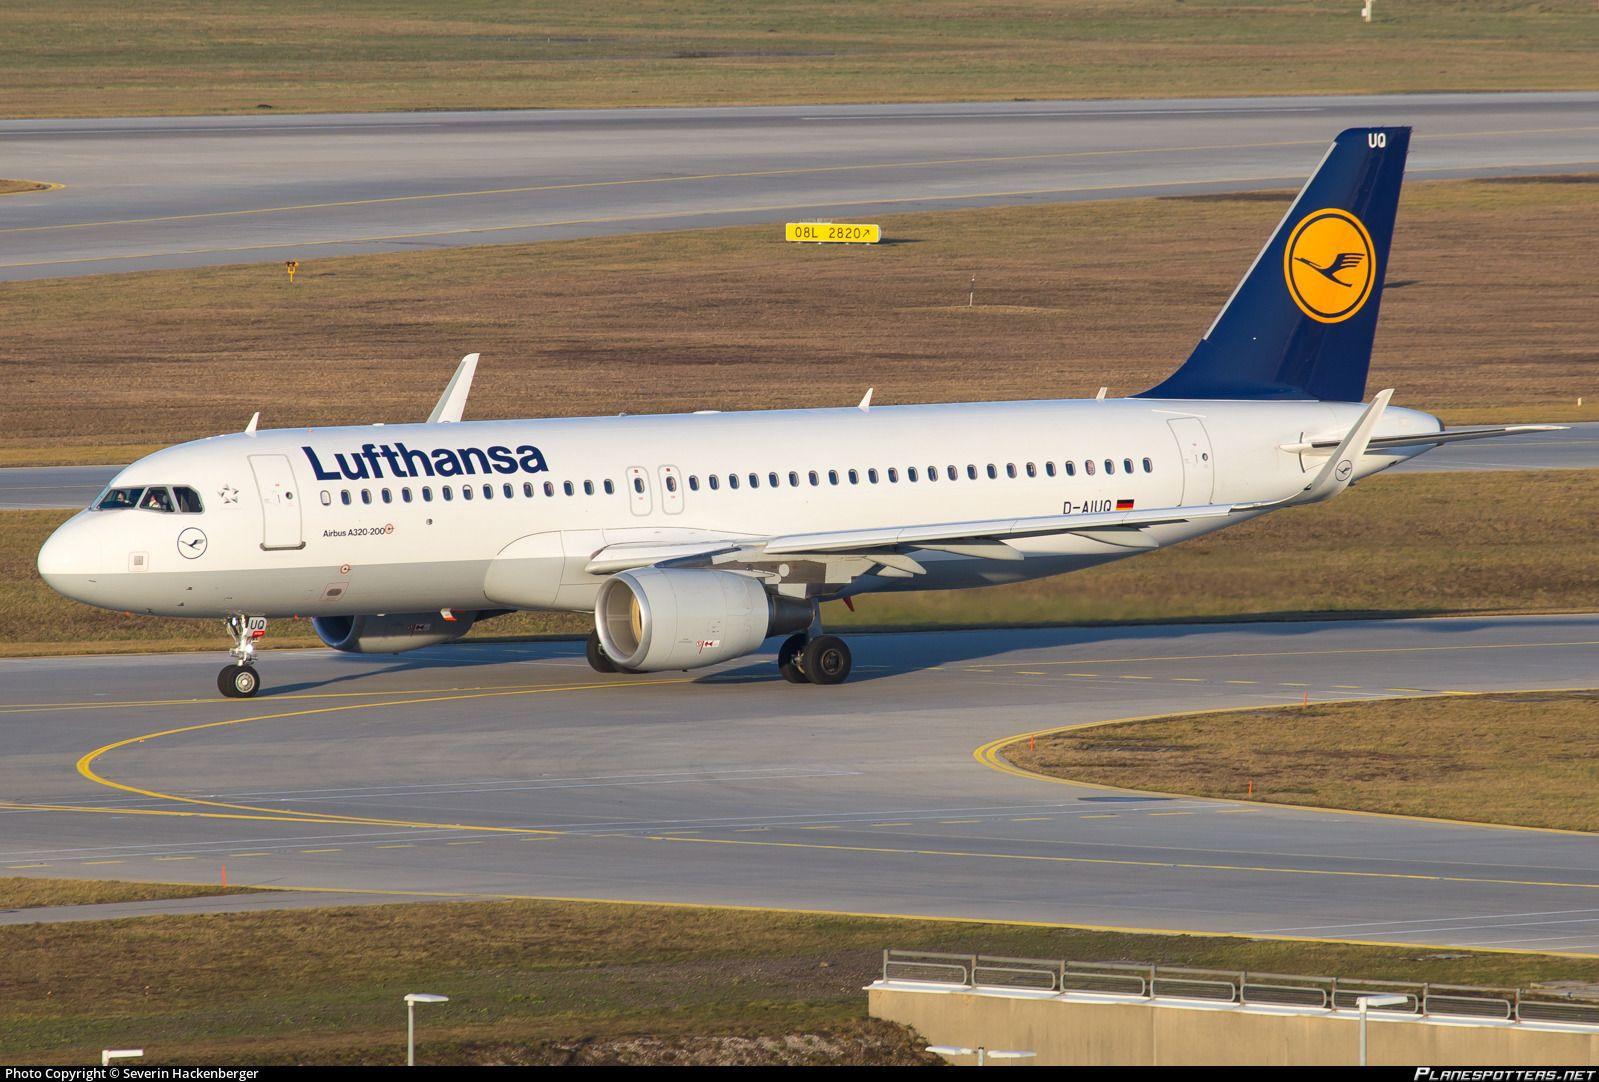 Airline Lufthansa Registration DAIUQ Aircraft Variant